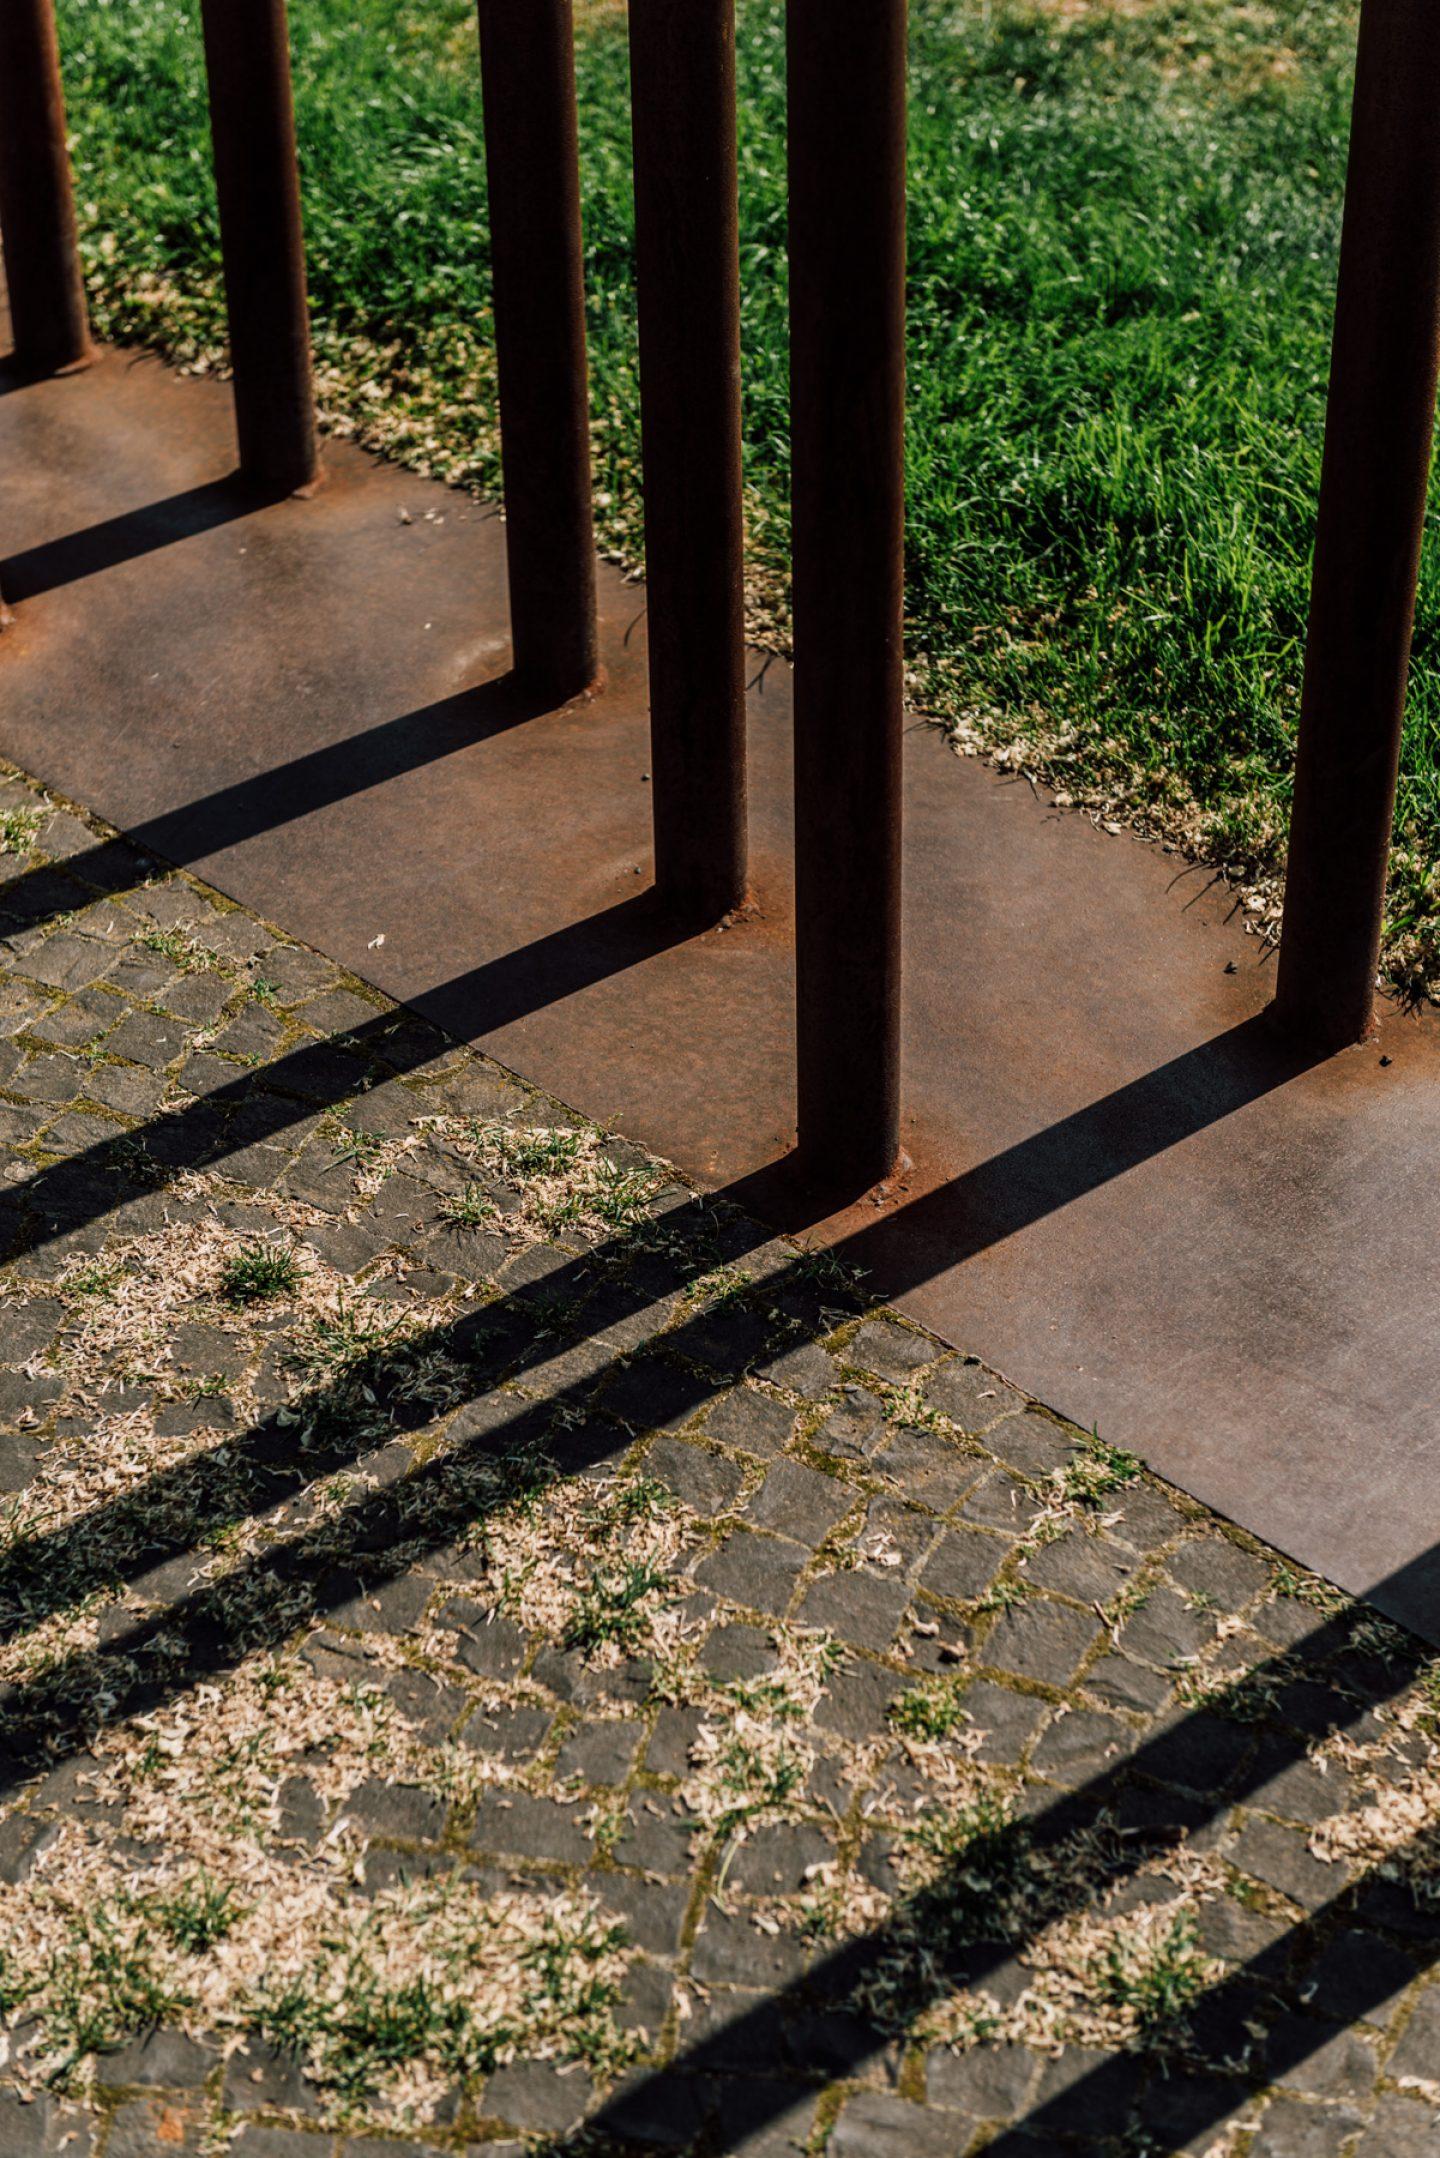 ignant-berlin-wall-biennale-5185